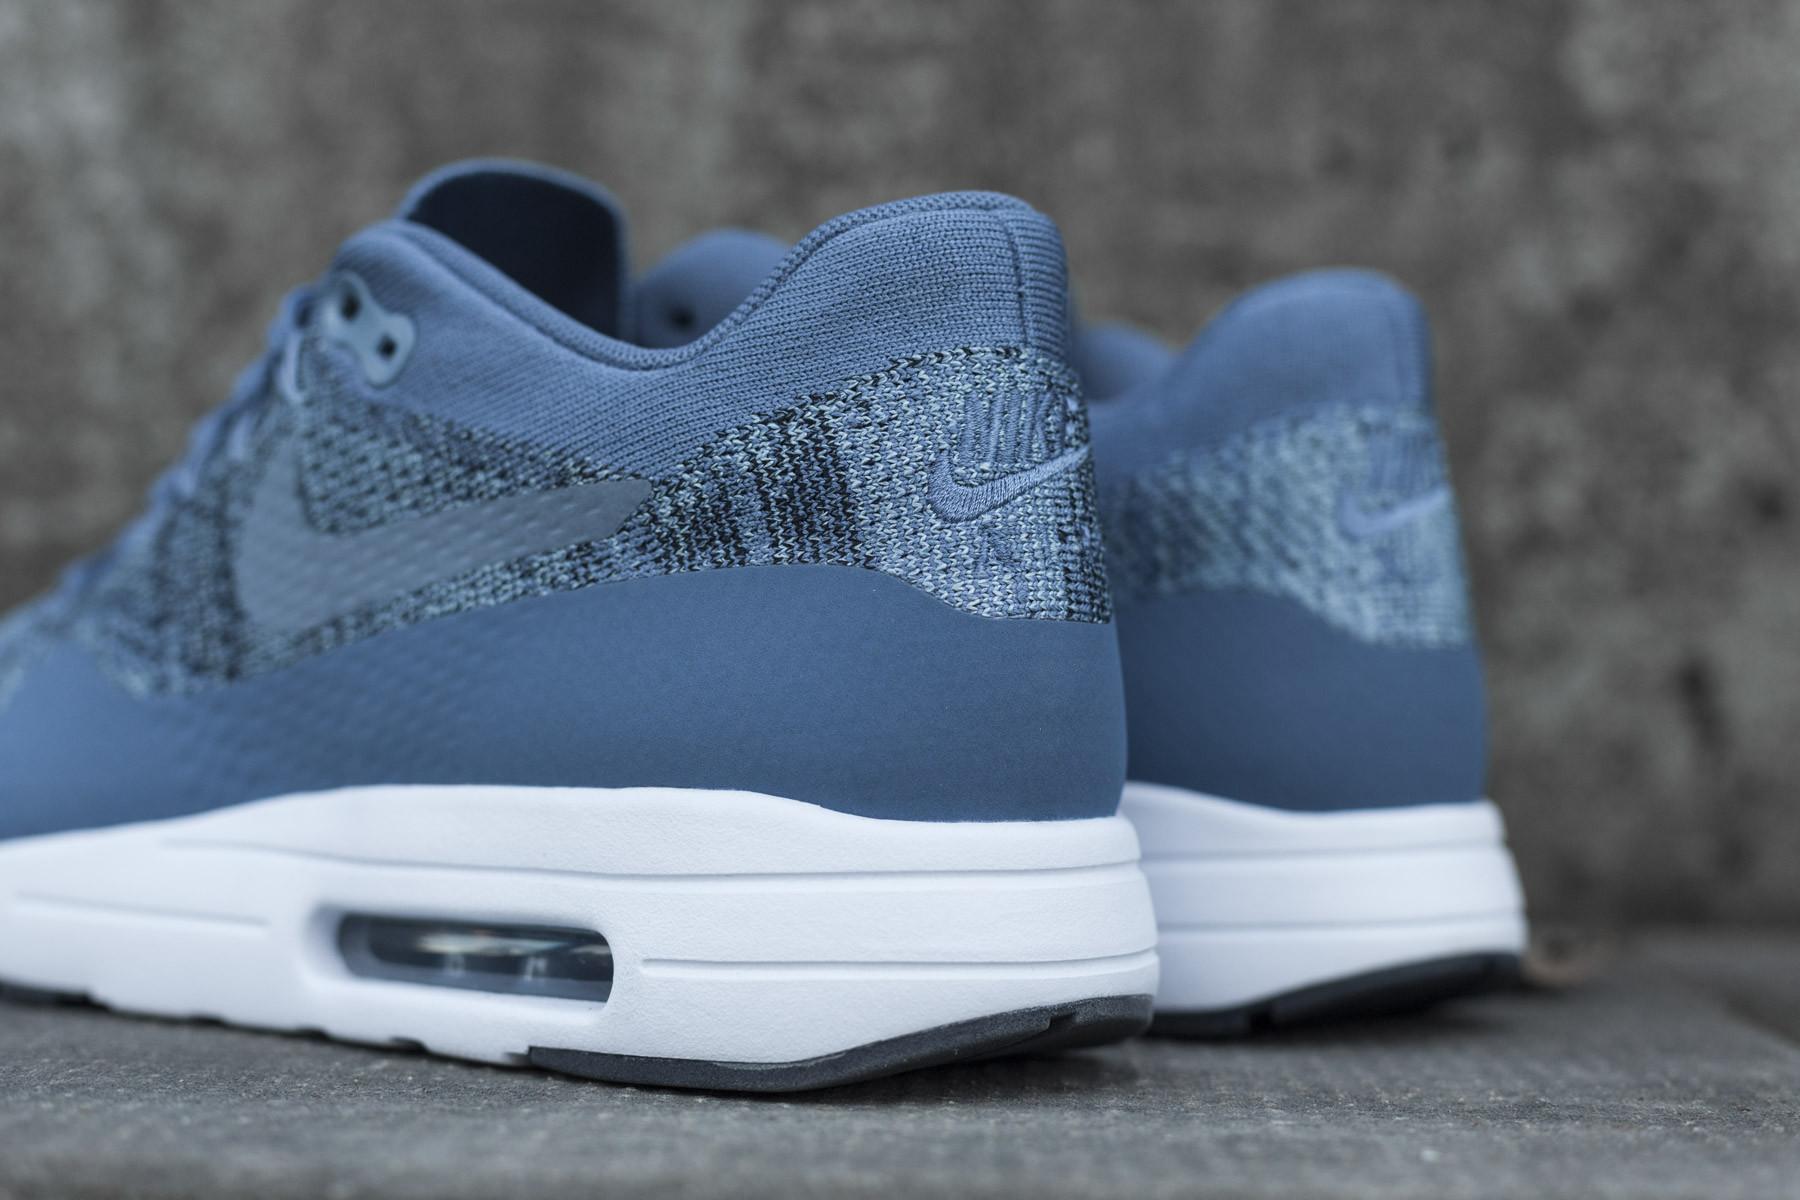 Nike Air Max 1 Ultra 2.0 Flyknit Sneaker.no